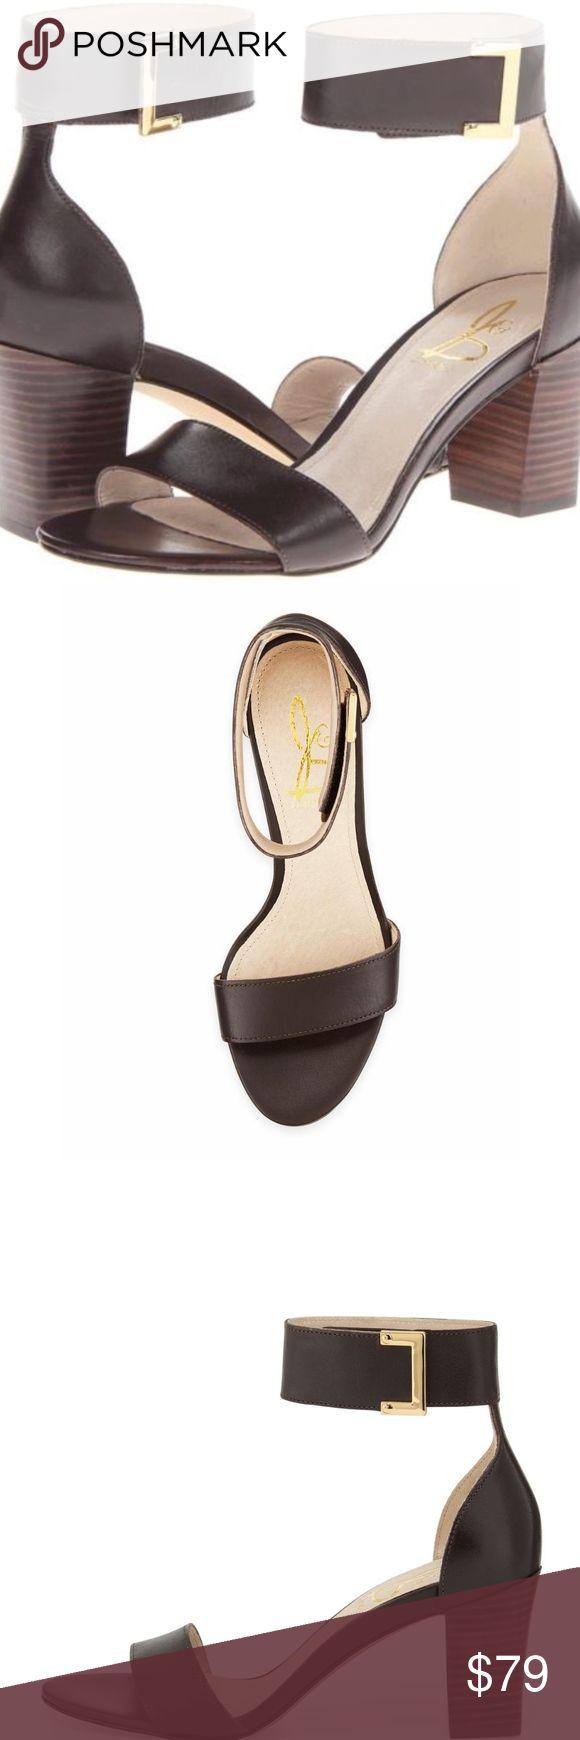 Joan & David Kentlee Sandals Size 11 NIB All leather Joan & David Kentlee Sandals Size 11 NIB Never worn. Joan & David Shoes Sandals